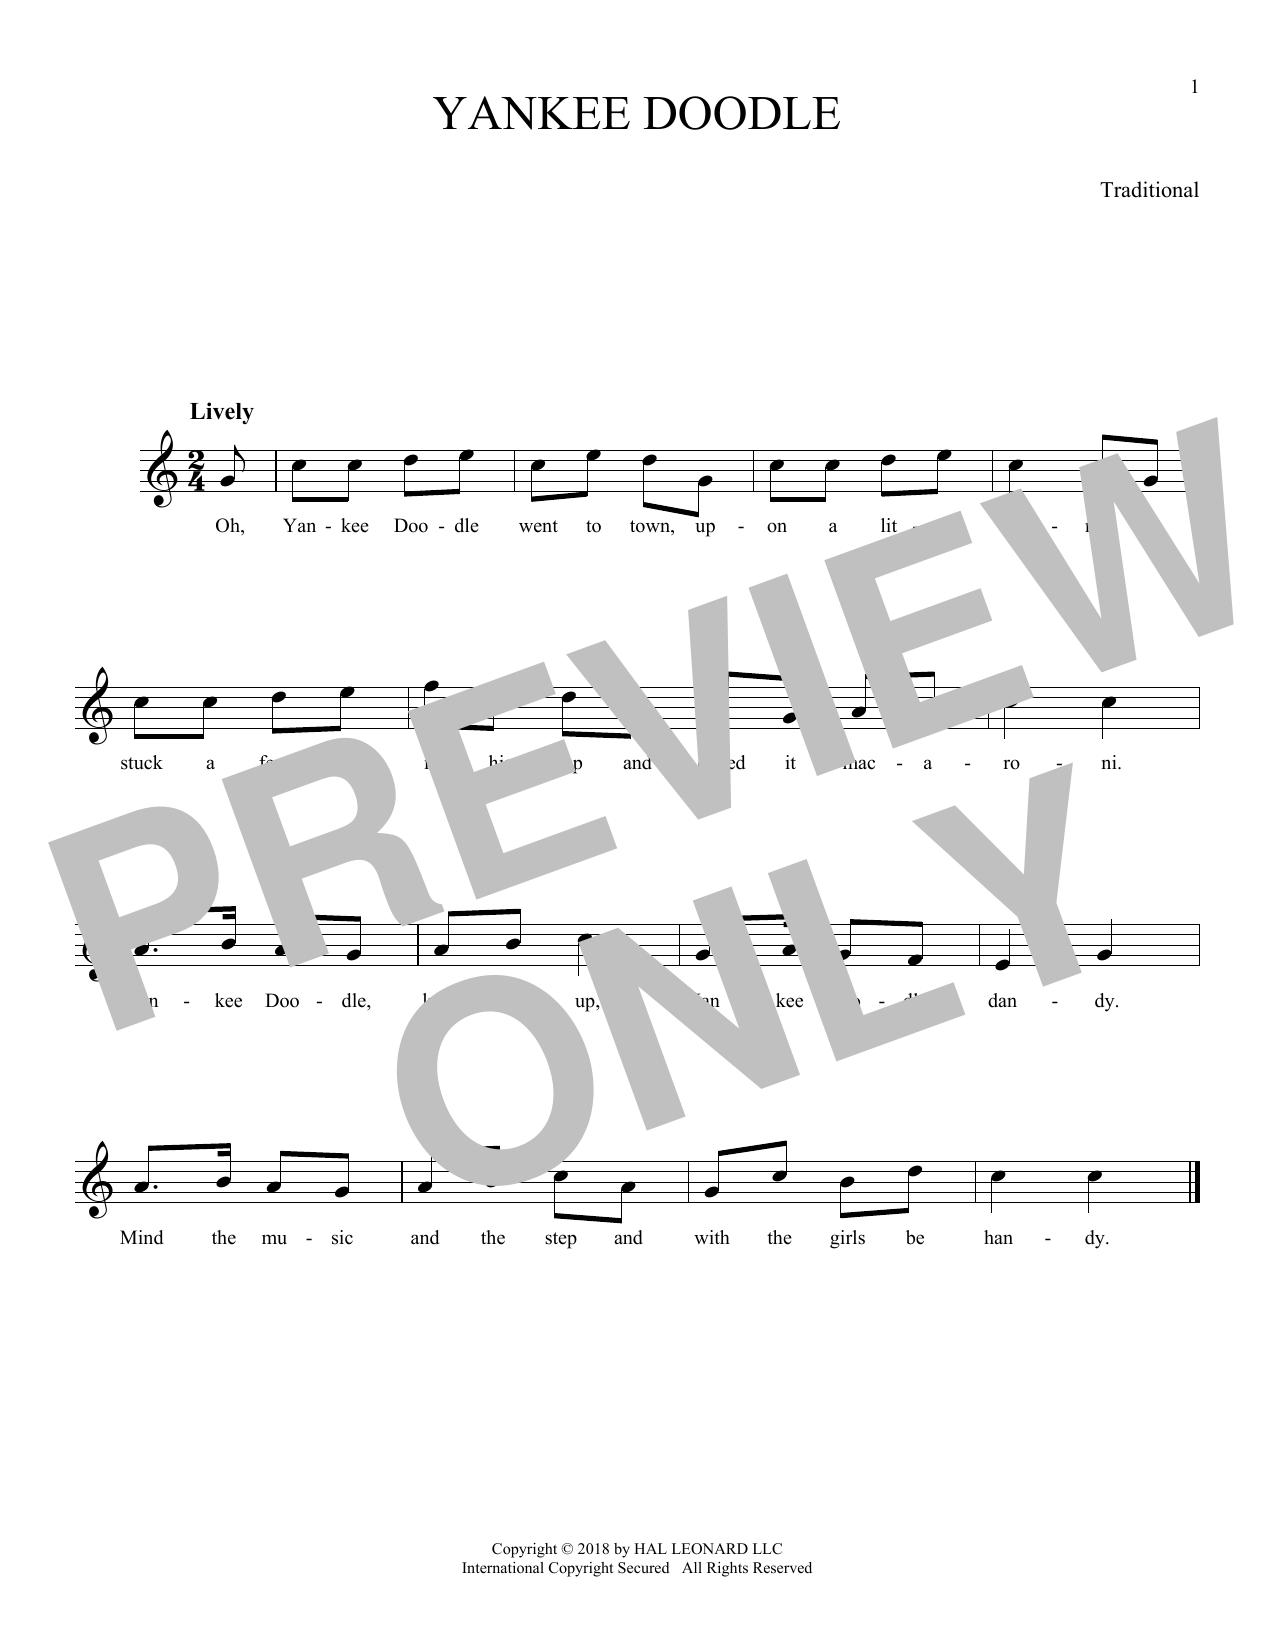 Sheet Music Digital Files To Print Licensed American Digital Sheet